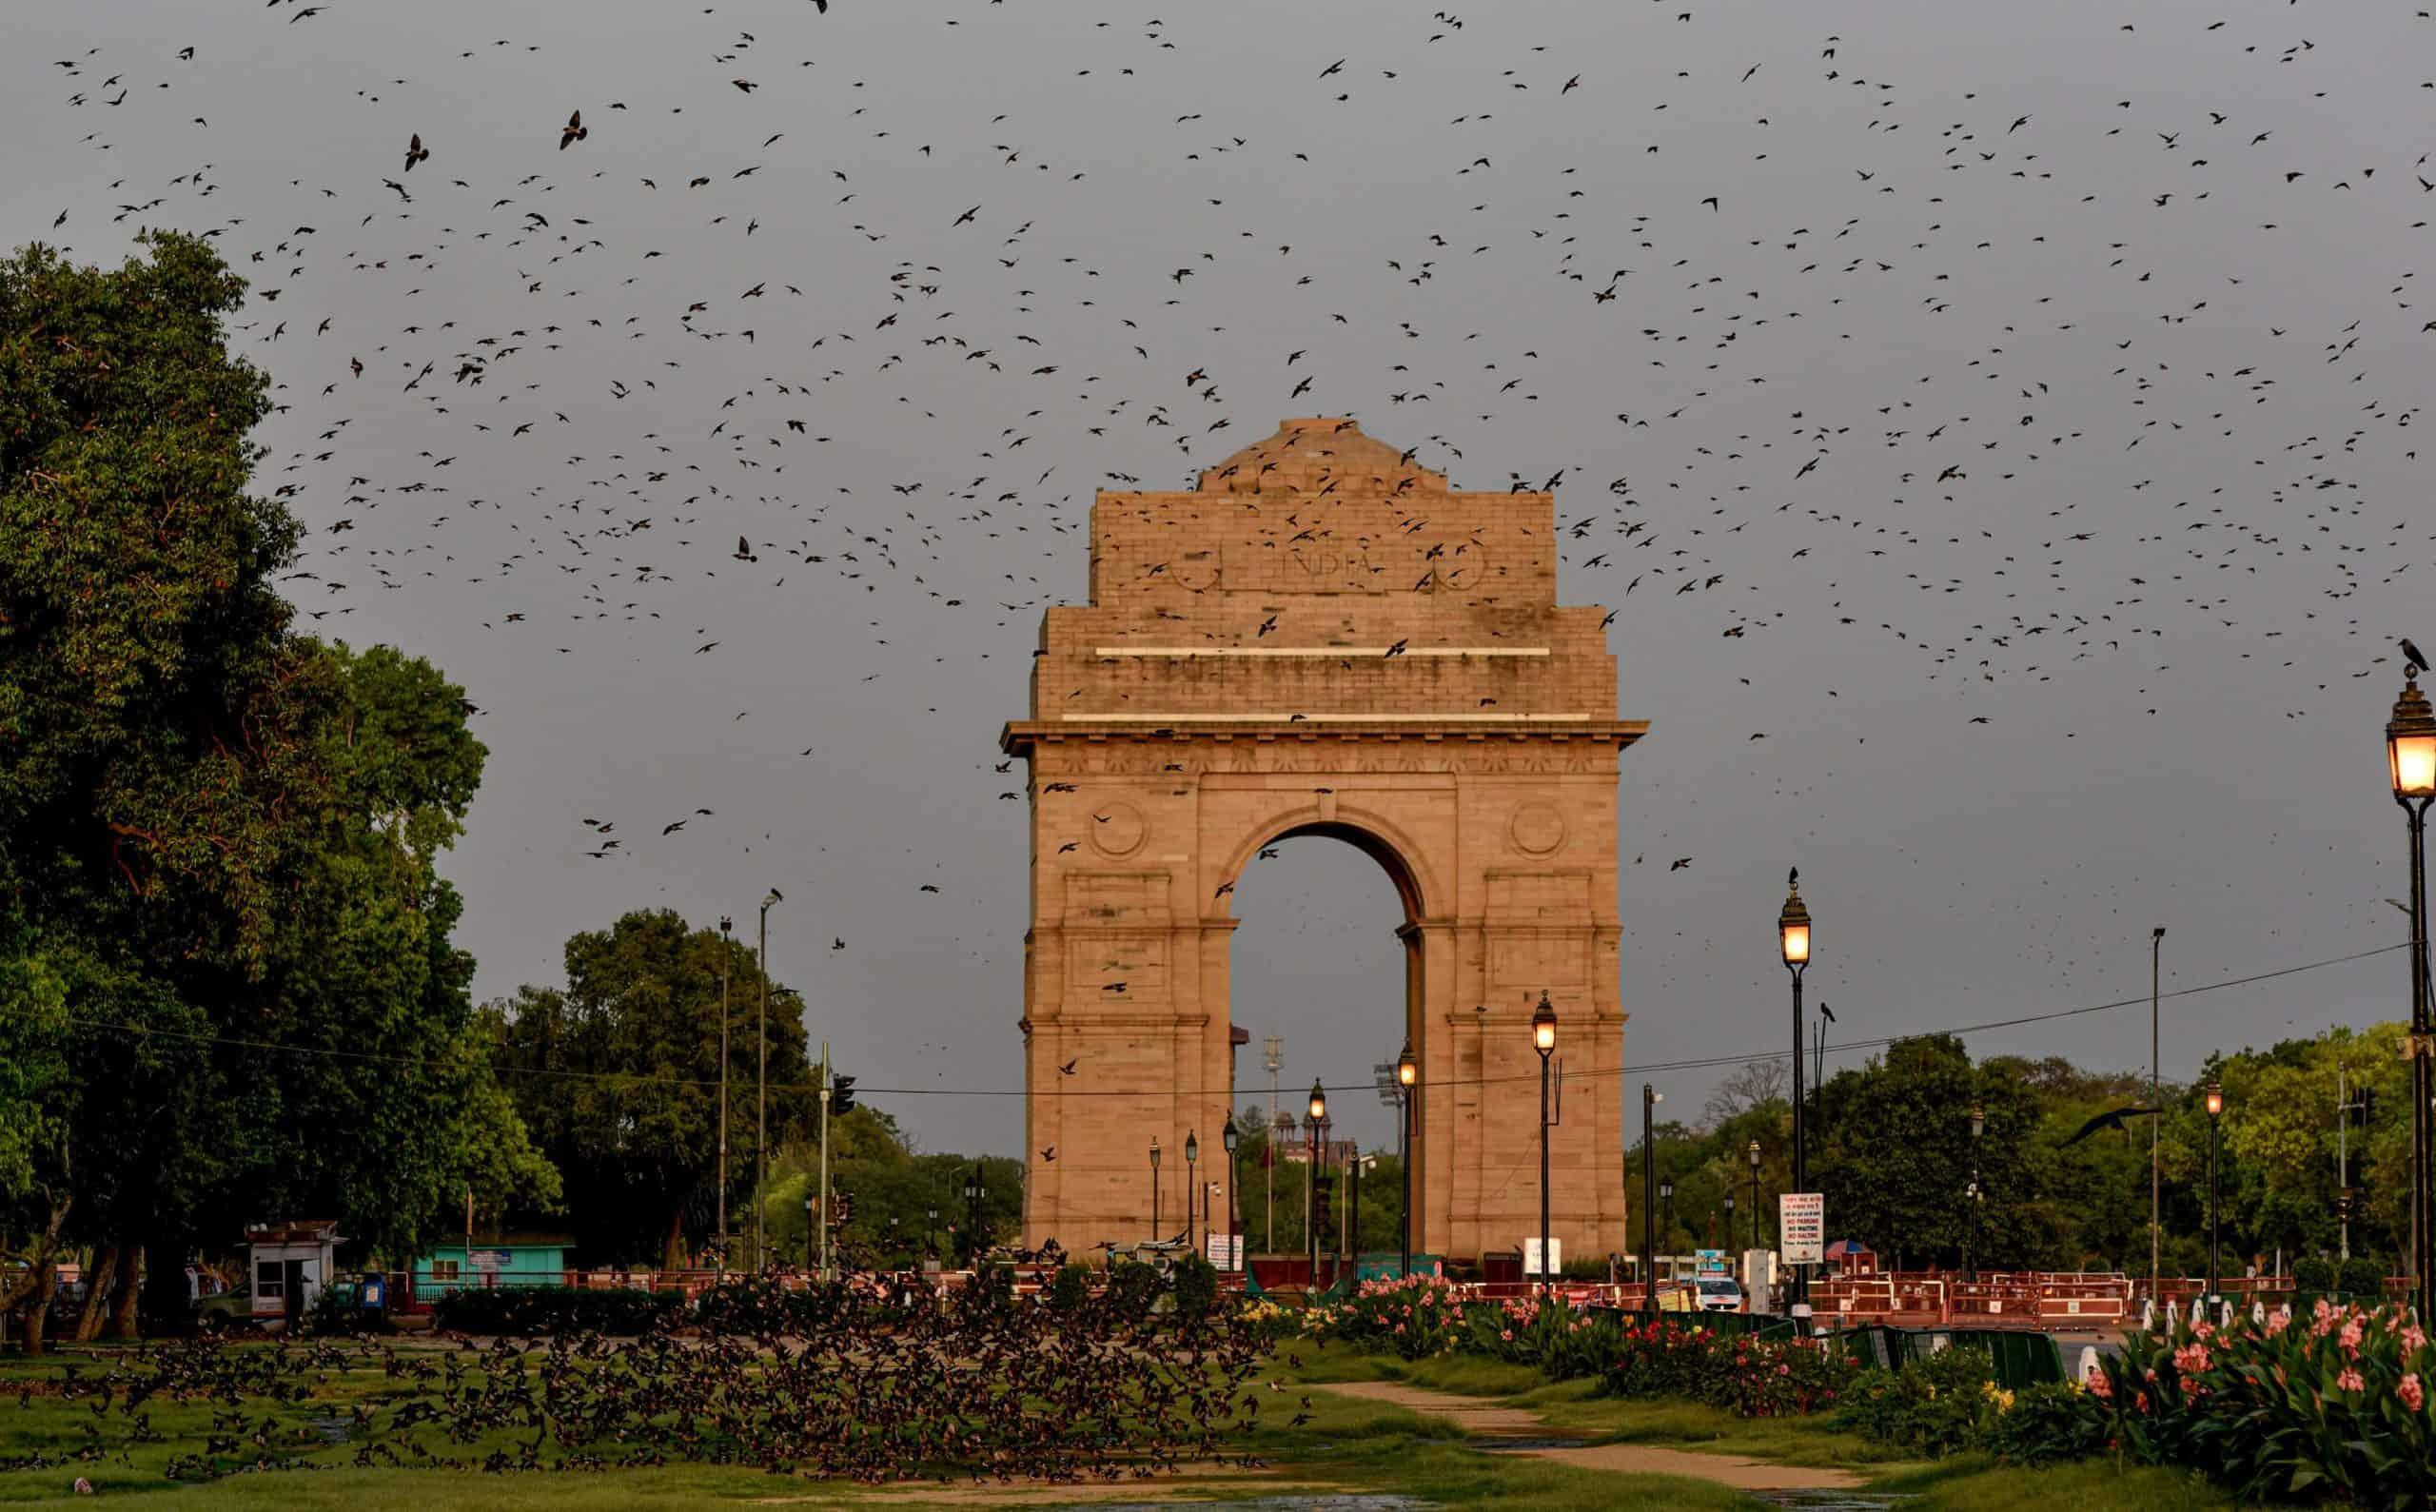 Design and Structure of India Gate - इंडिया गेट का डिज़ाइन और संरचना